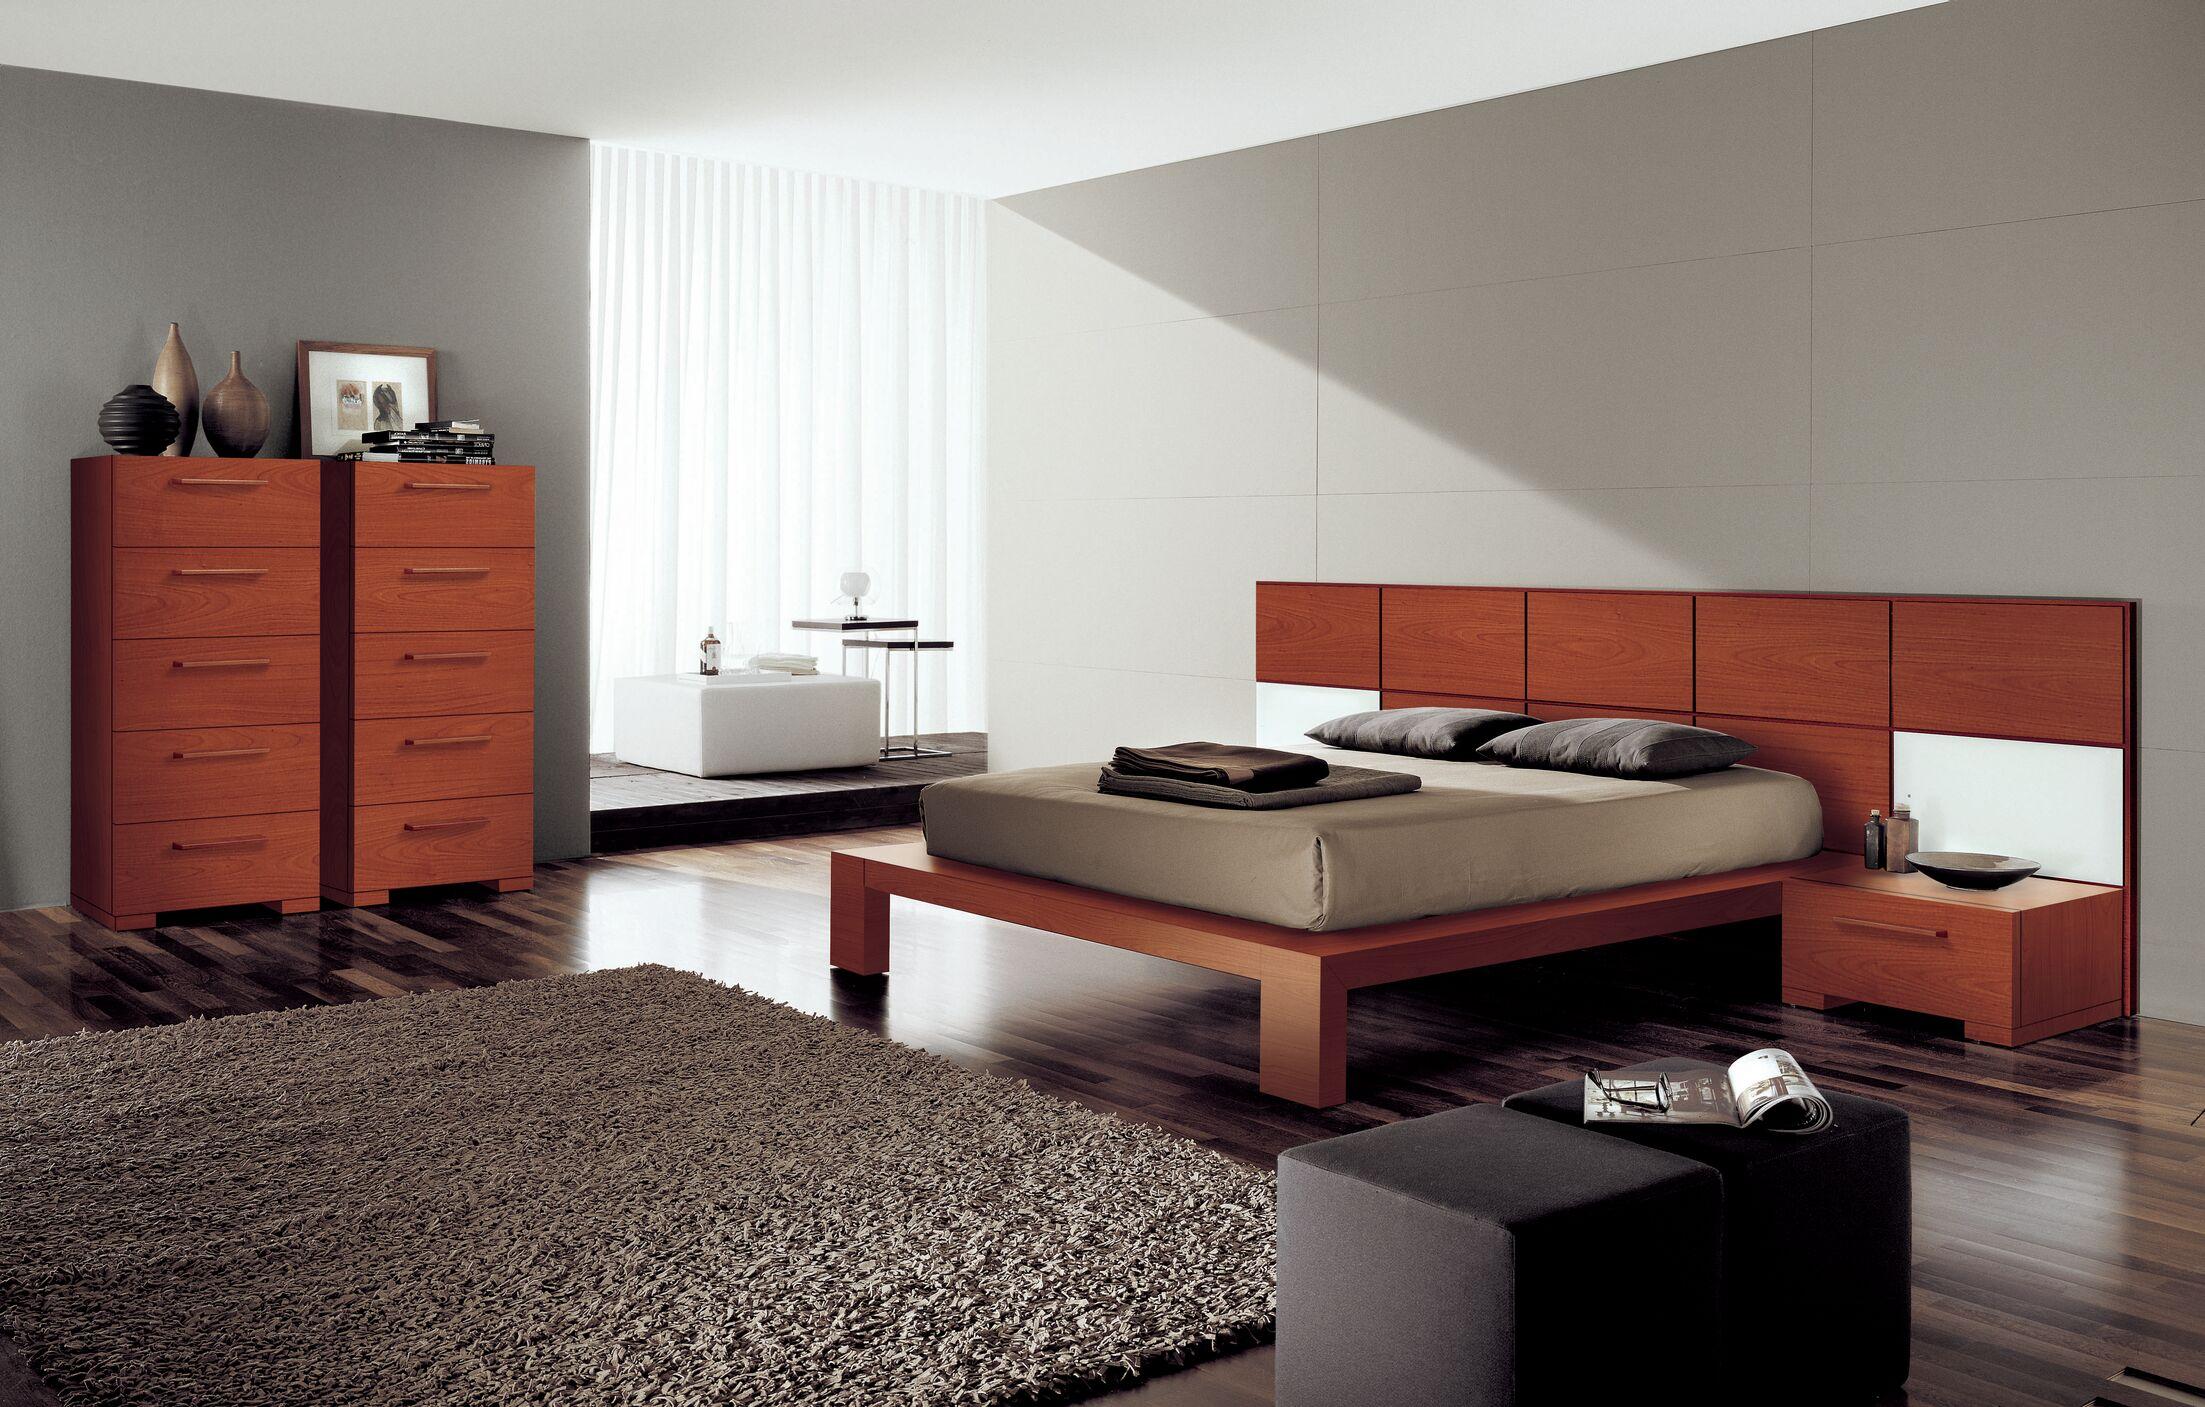 Wynd Platform Bed Size: King, Color: Cherry